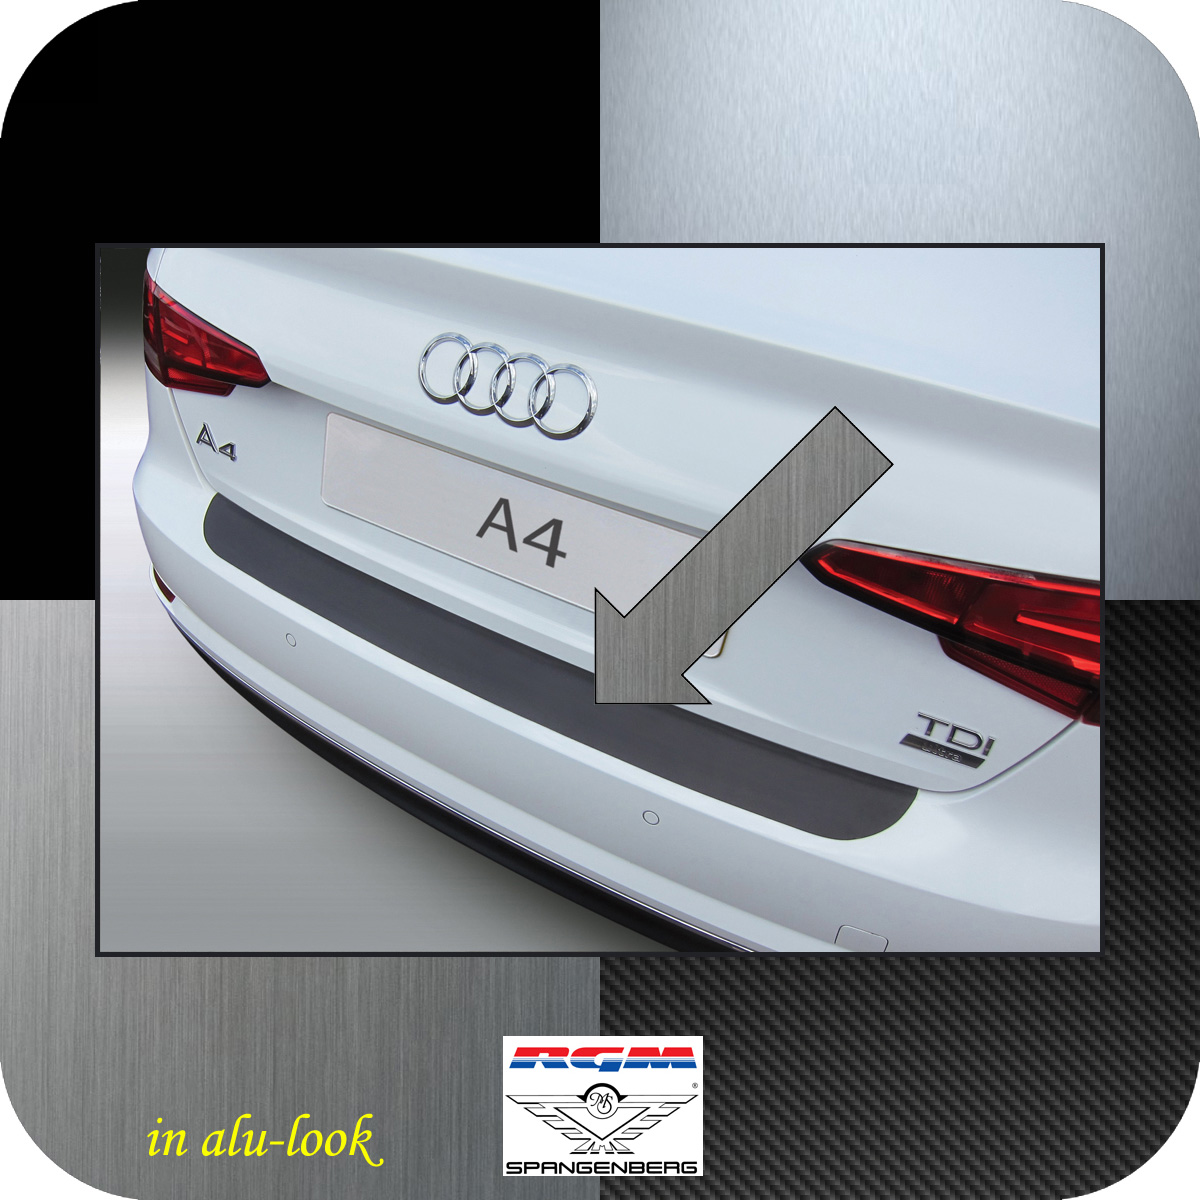 Ladekantenschutz Alu-Look Audi A4 B9 Limousine 4-Türer ab Baujahr 2015- 3504960